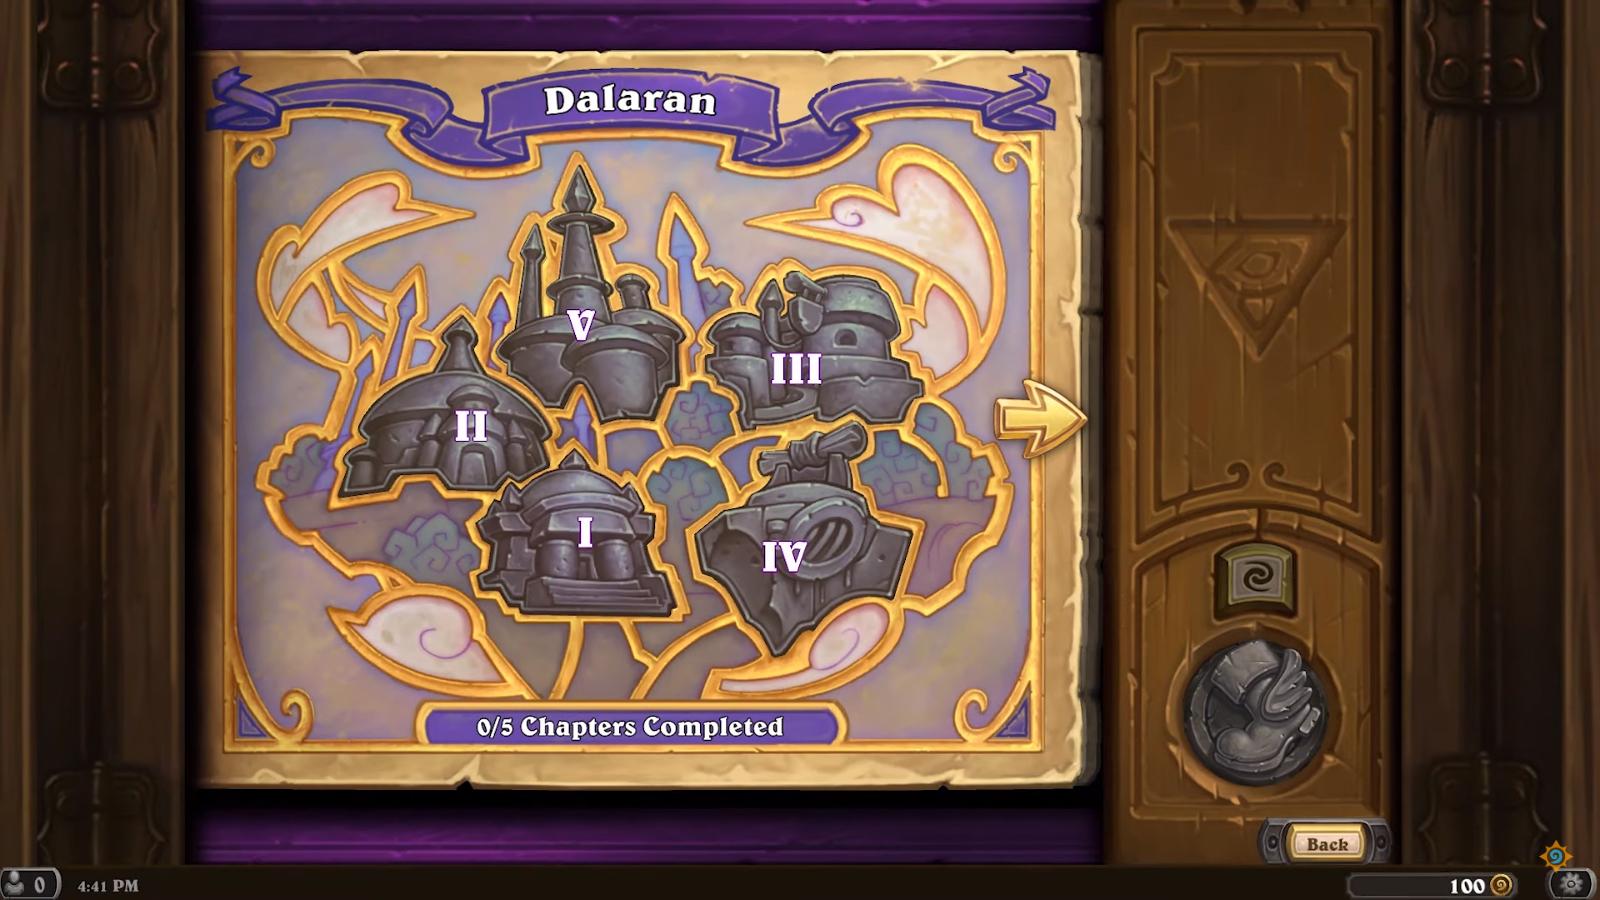 L'aventure est divisée en 5 chapitres représentant des lieux symboliques de Dalaran